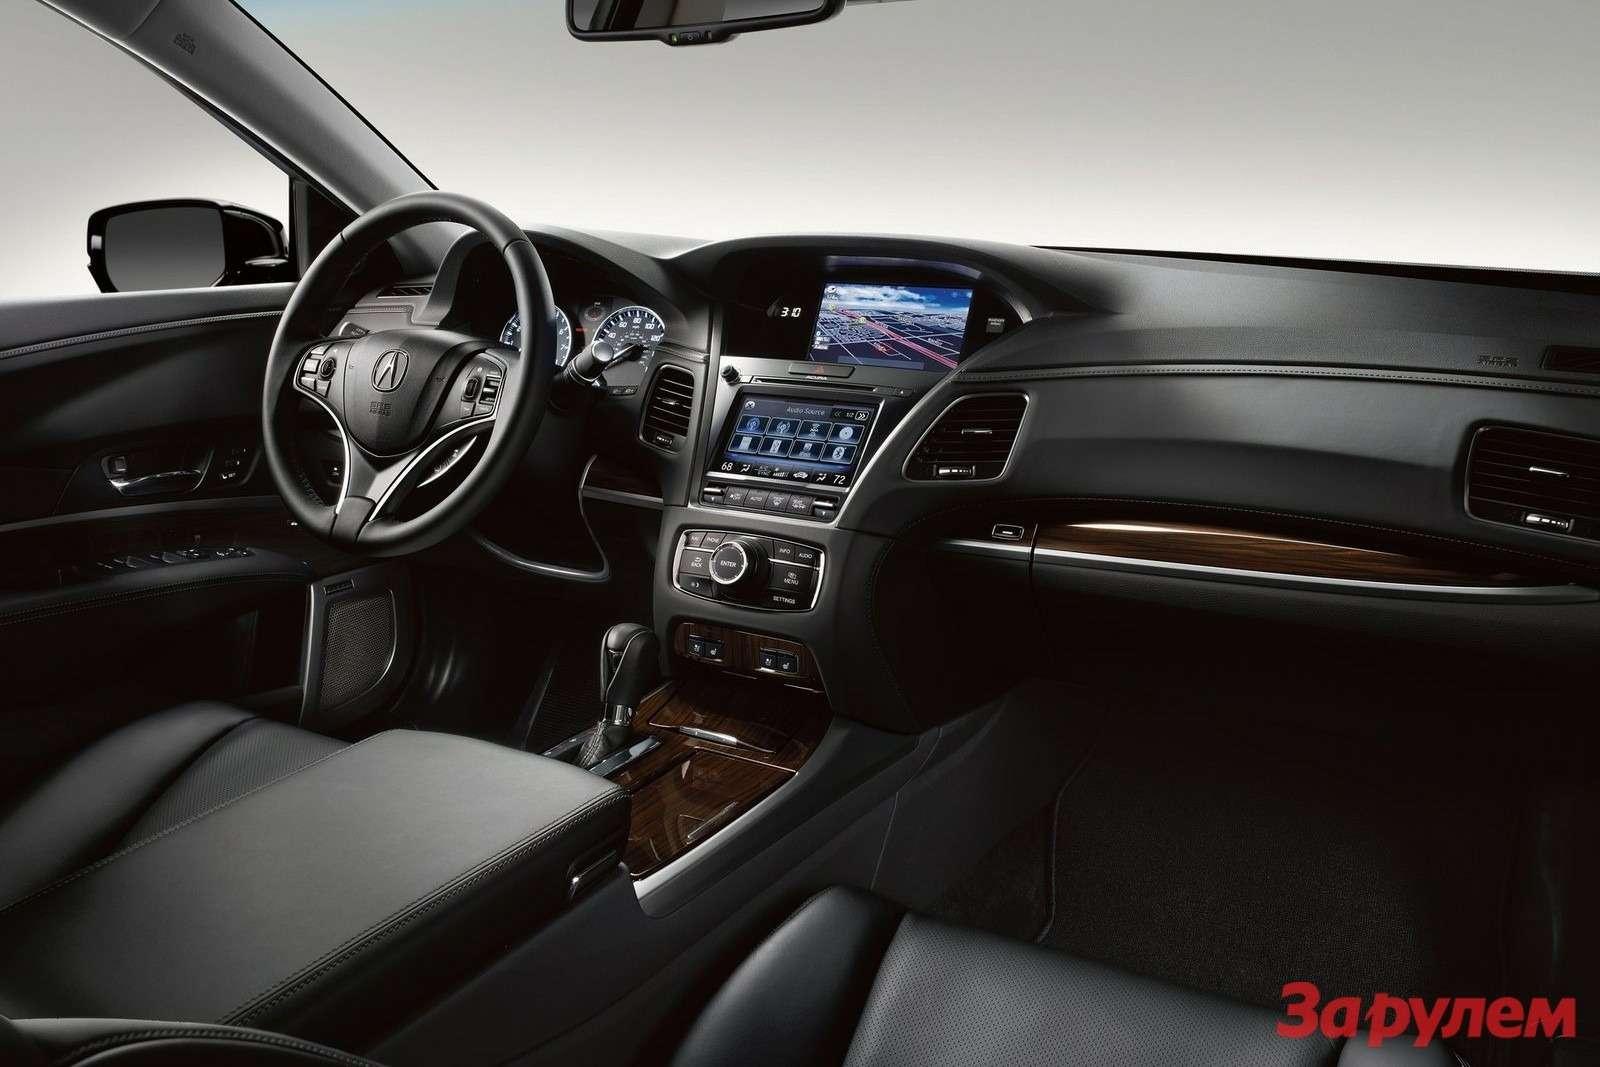 Acura RLX 2014 1600x1200 wallpaper 57